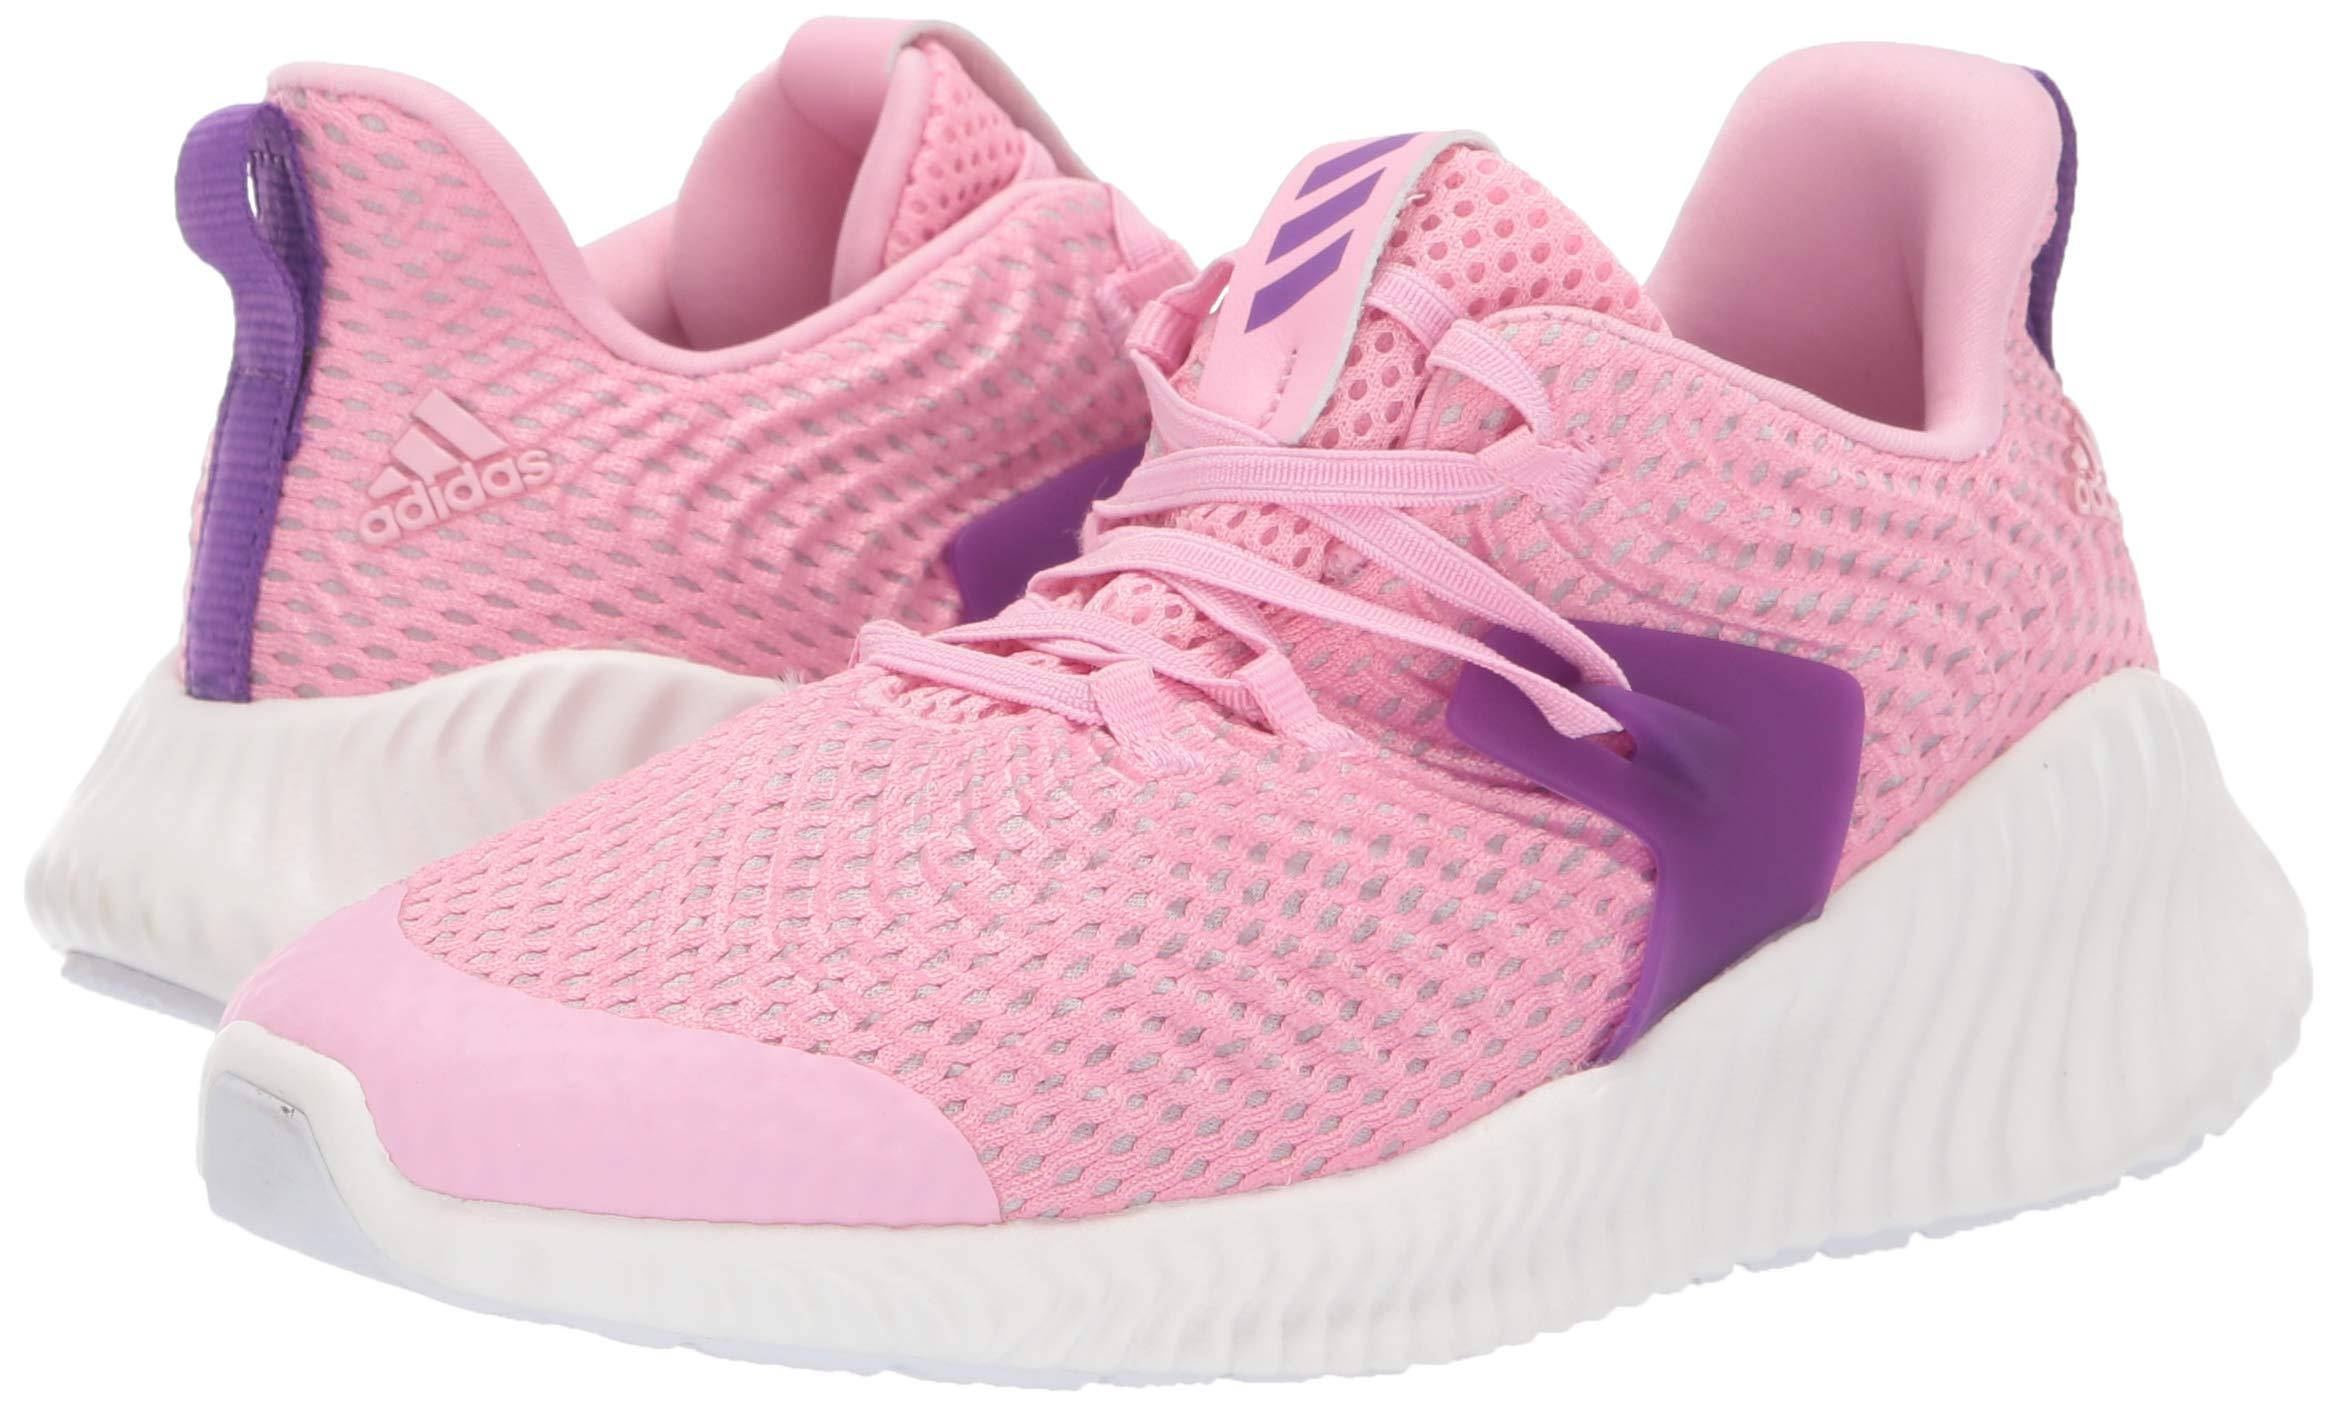 Adidas Kids Alphabounce Instinct, true pink/active purple/cloud white 2.5 M US Little Kid by adidas (Image #6)